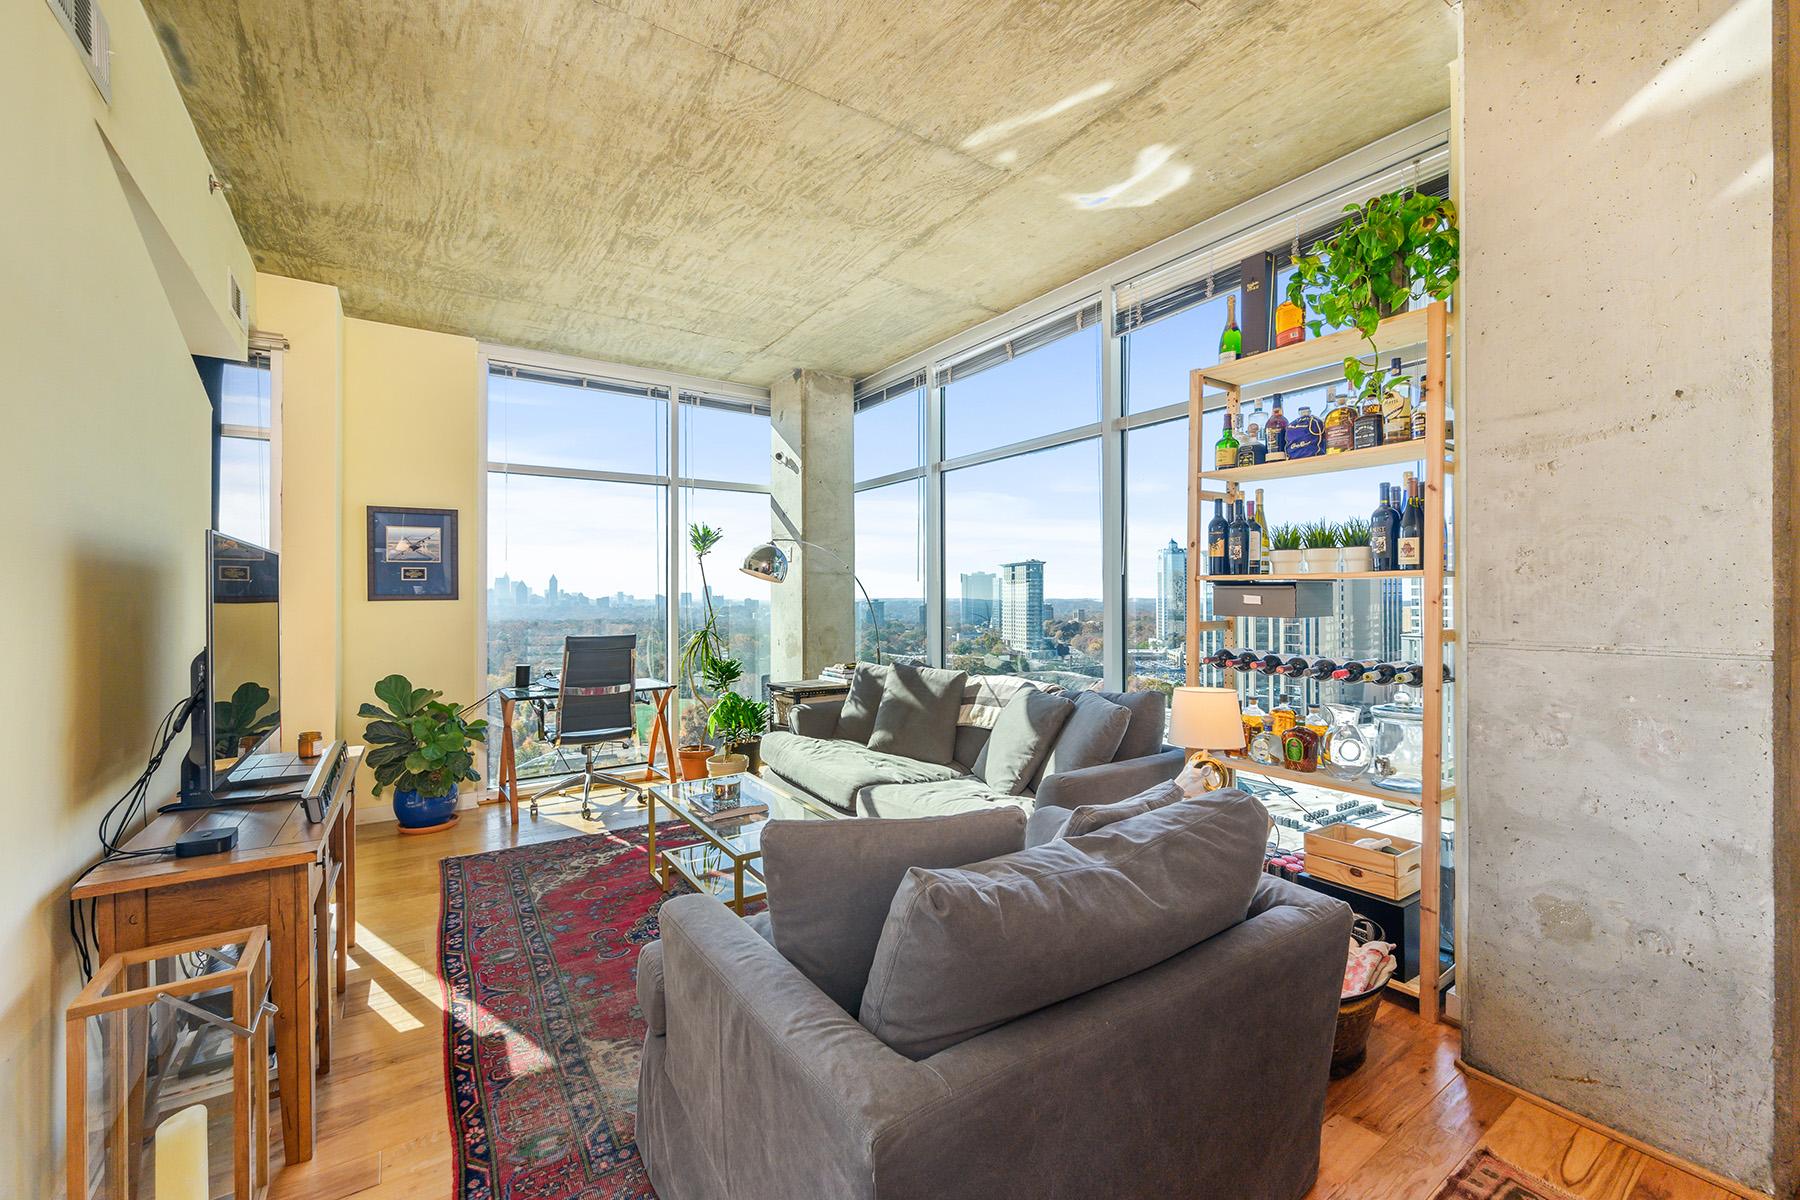 Condominiums için Satış at Incredible Views in Prime Buckhead Location 250 Pharr Road NE No. 1517, Atlanta, Georgia 30305 Amerika Birleşik Devletleri